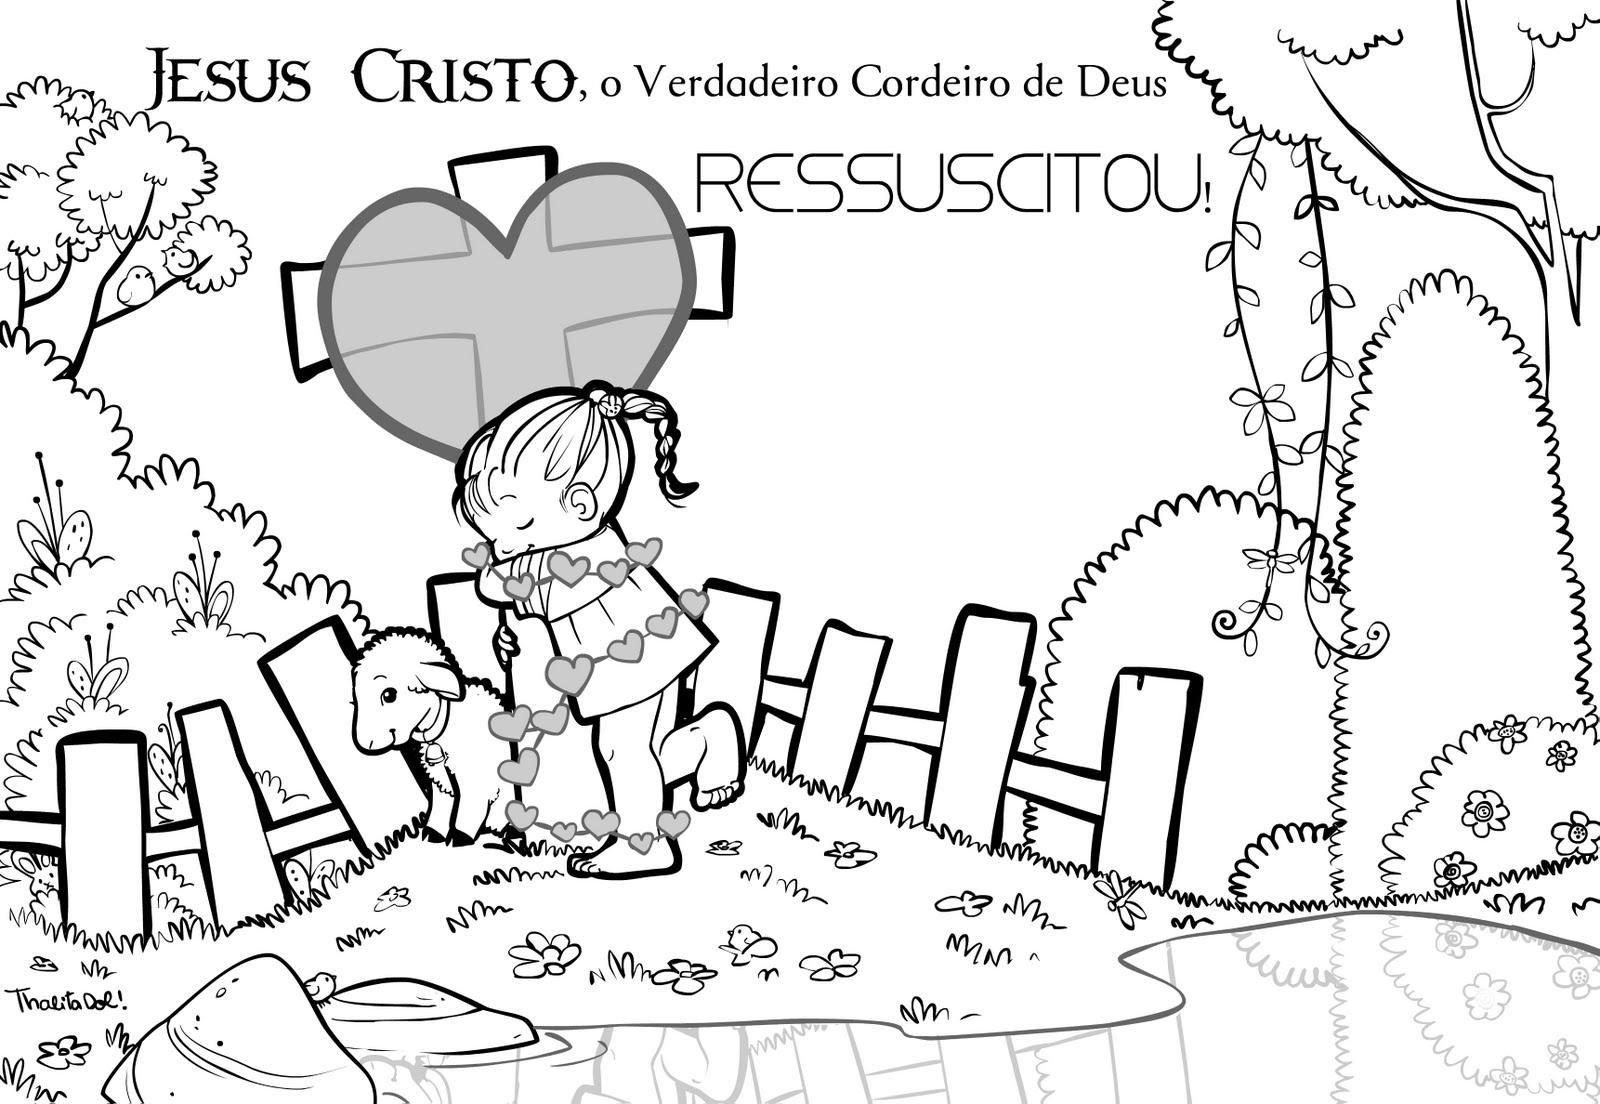 SANTO TABERNACULO: A VERDADEIRA PÁSCOA. | Wielkanoc EASTER | Pinterest